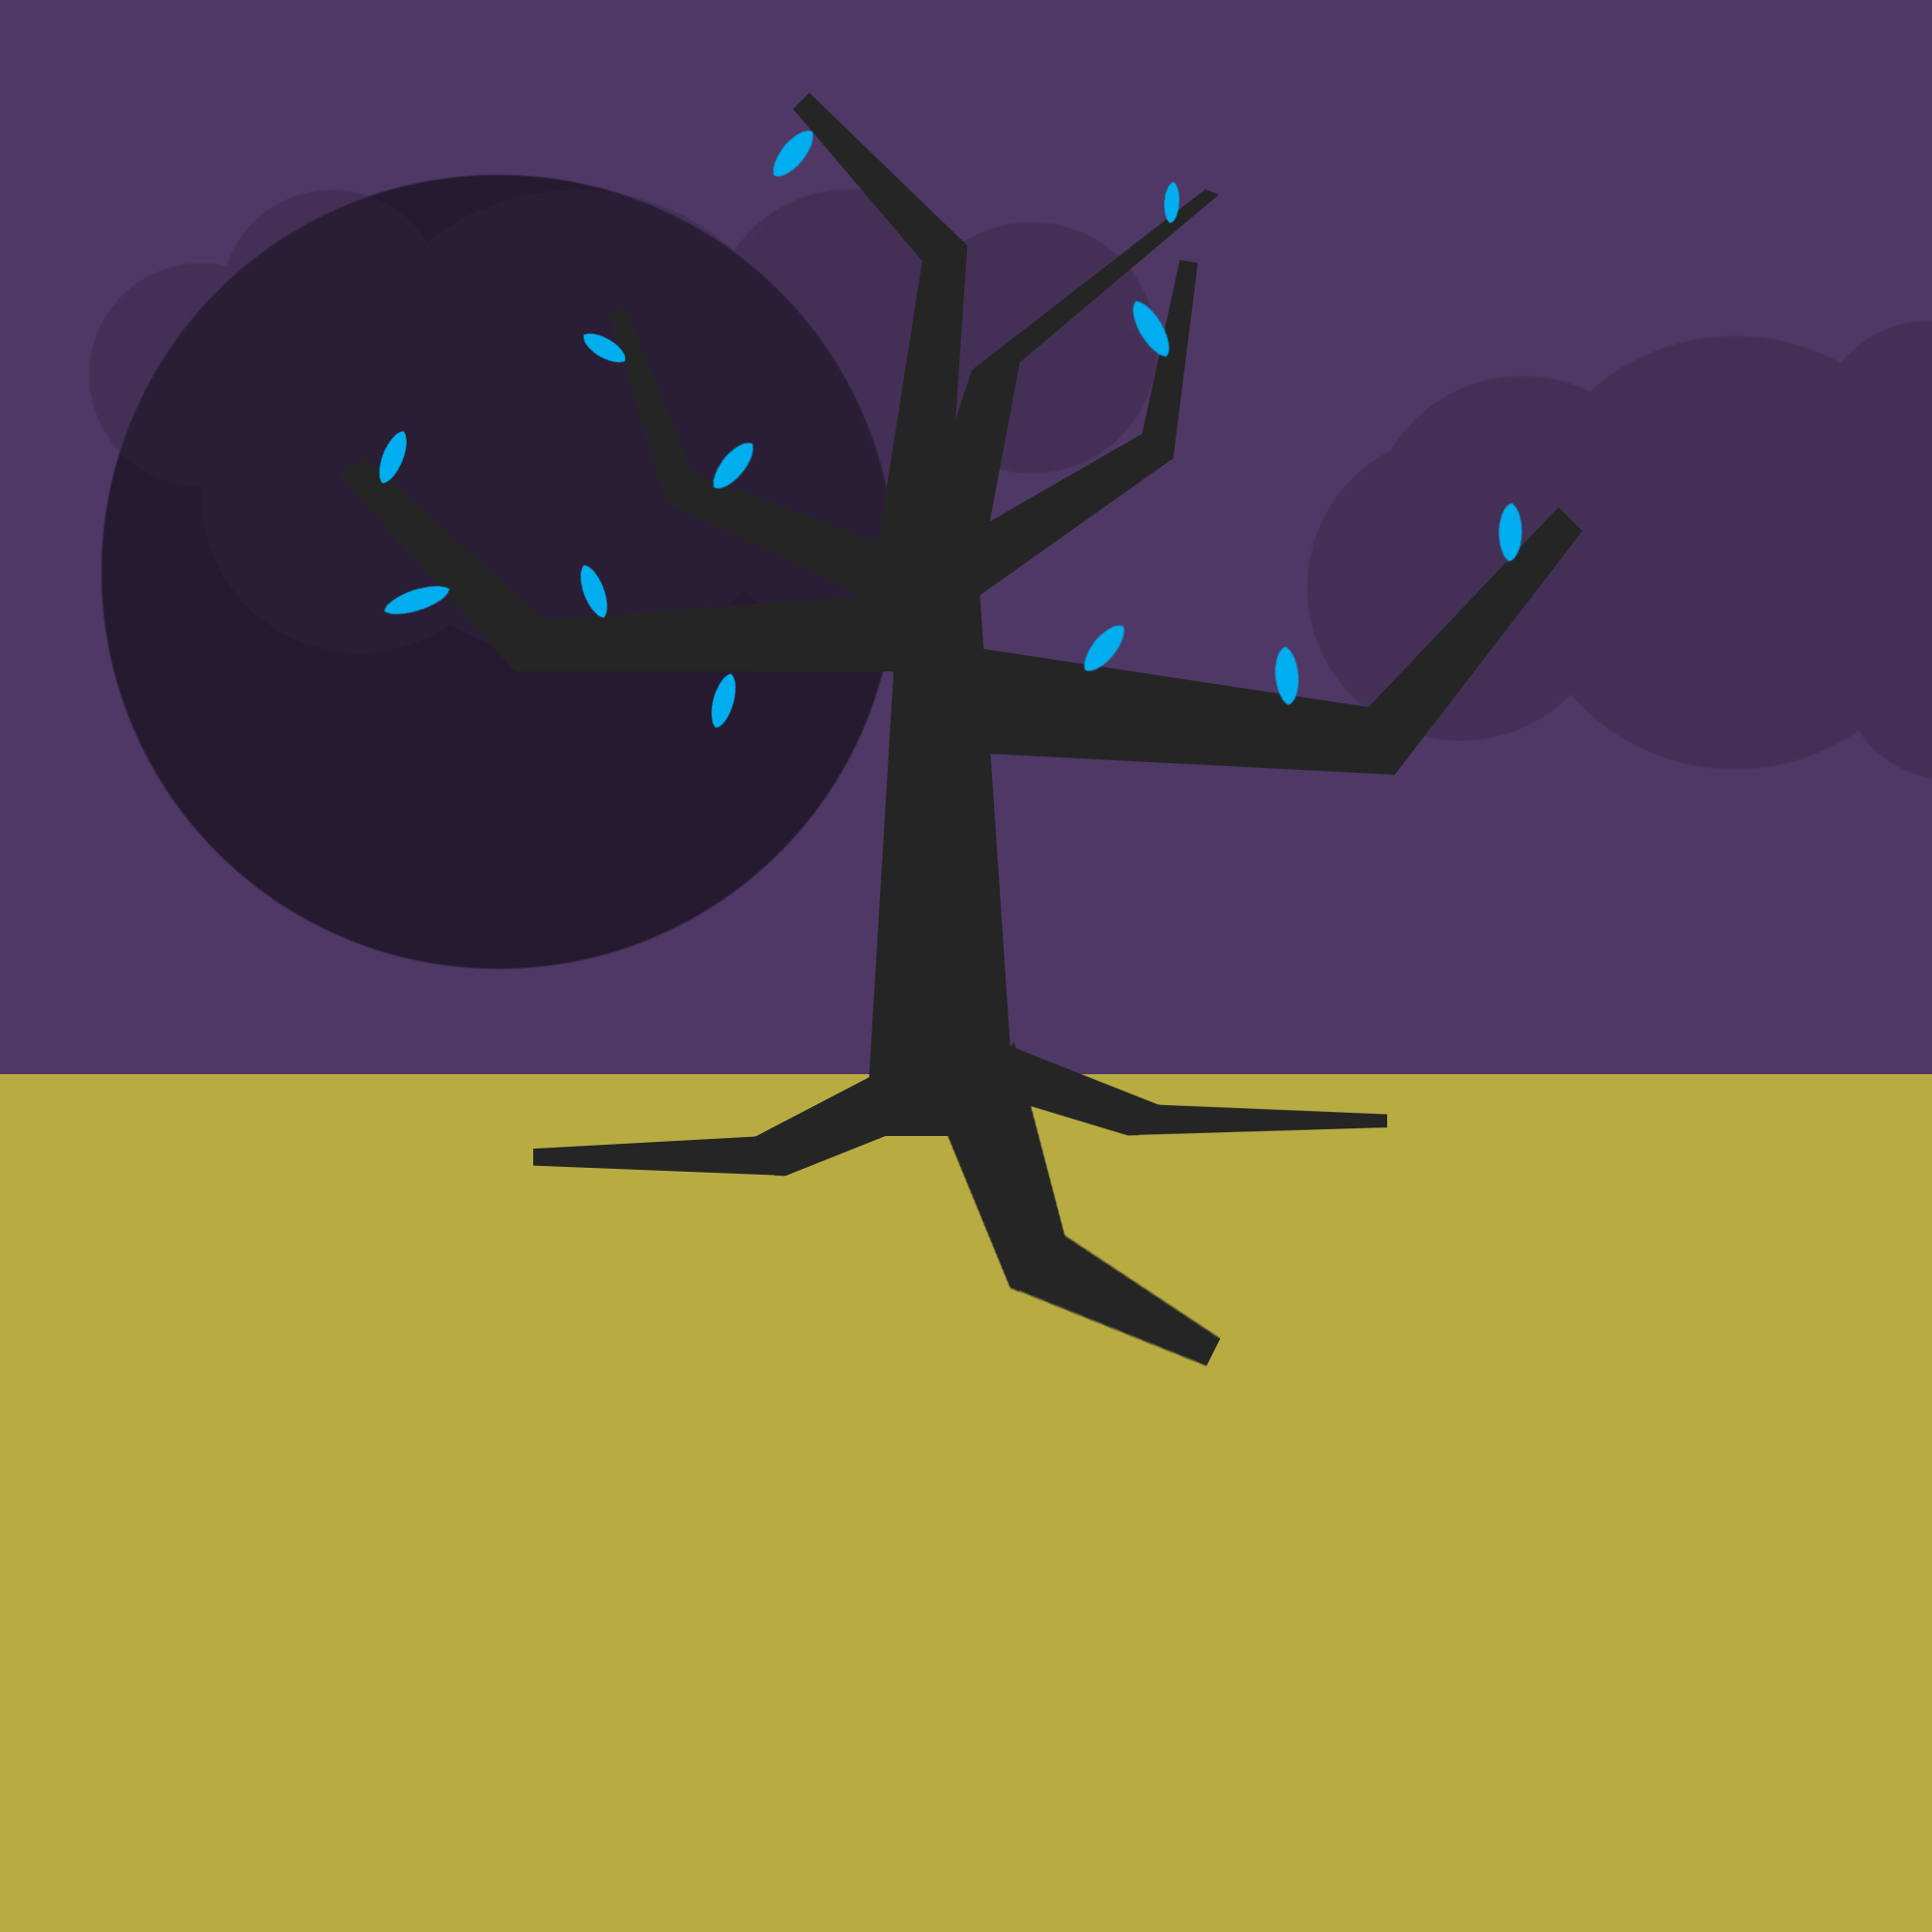 The Purple Planet